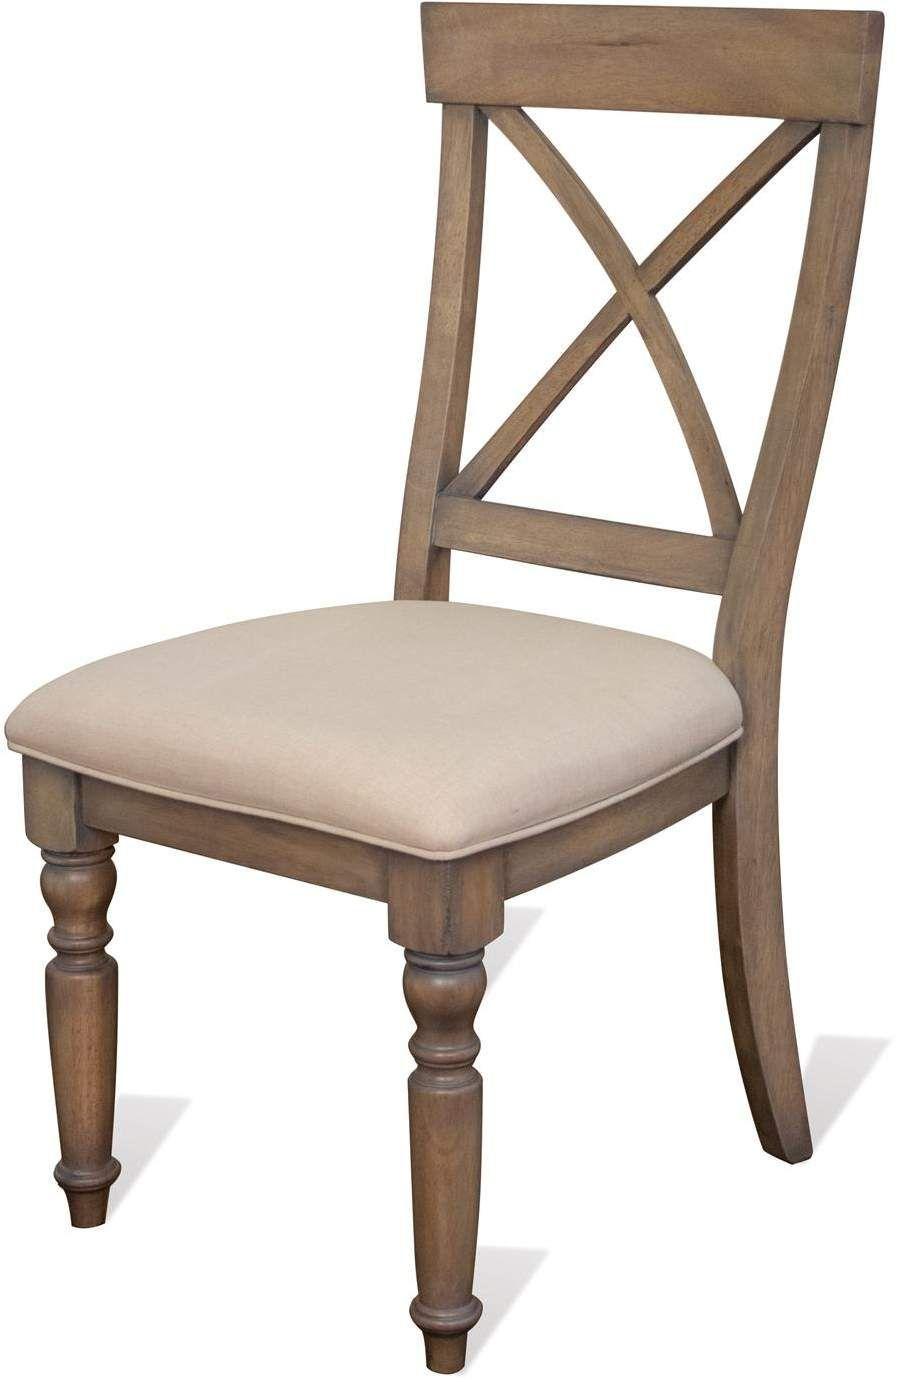 X-Back Side Chair At Furniture Rewards